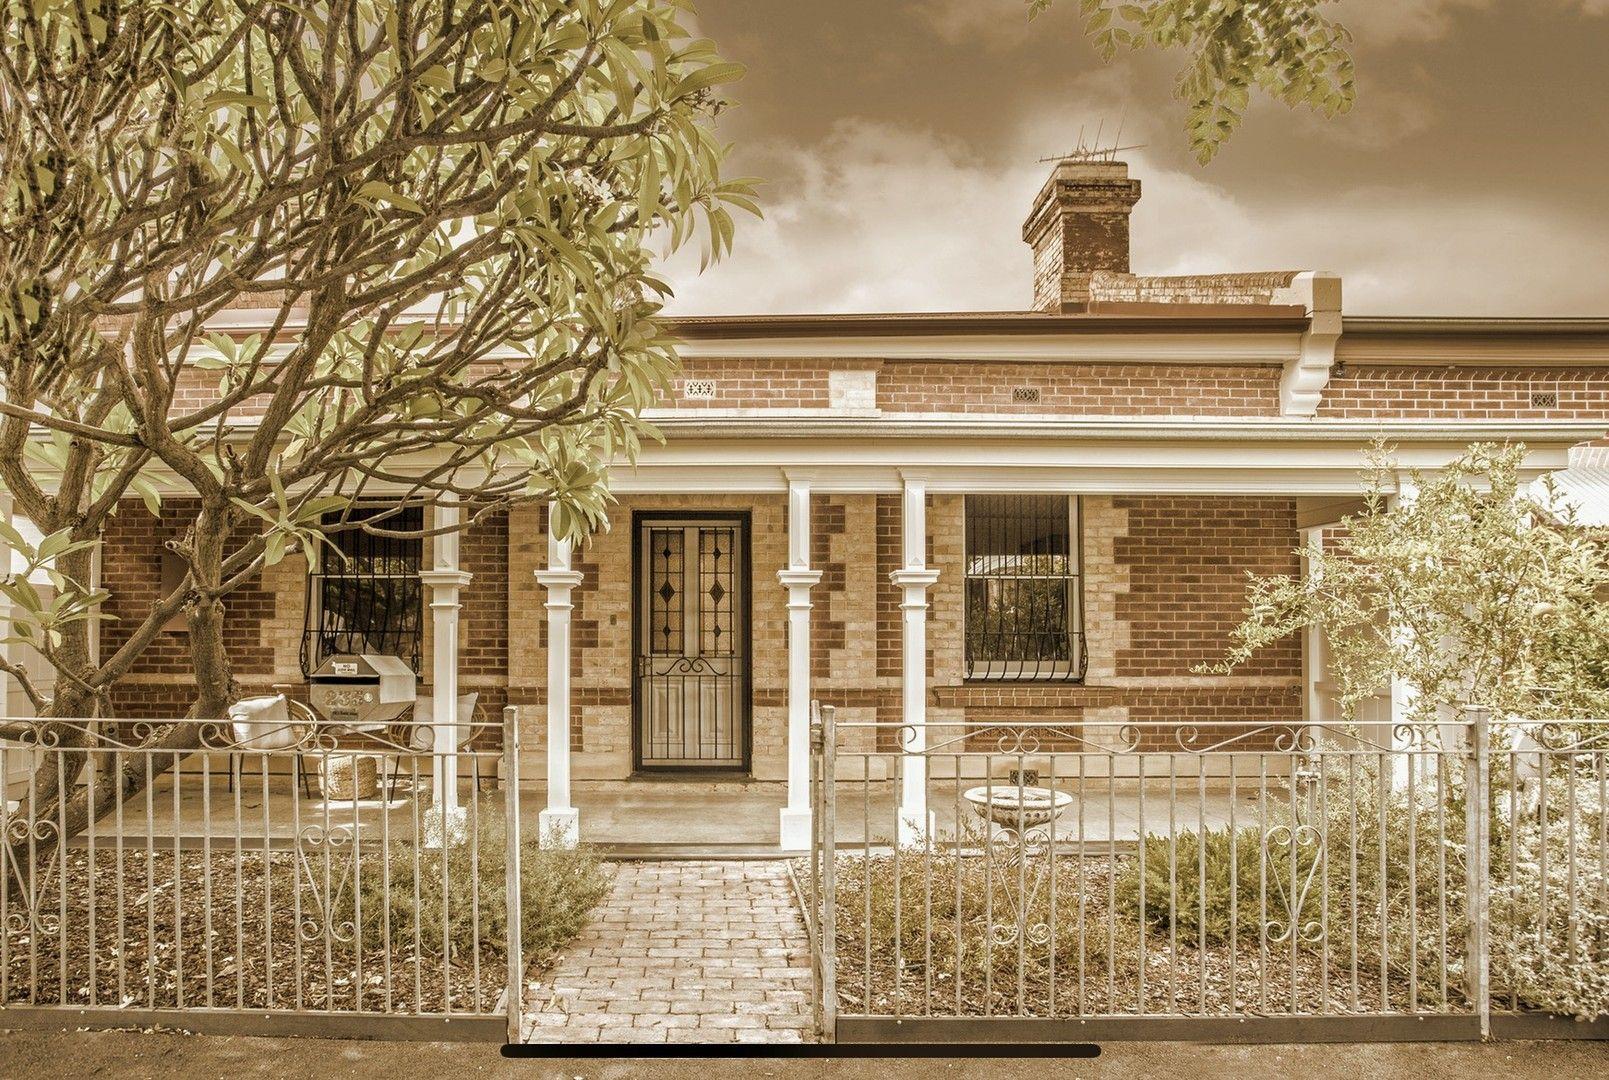 3 bedrooms House in 235 Gilbert Street ADELAIDE SA, 5000